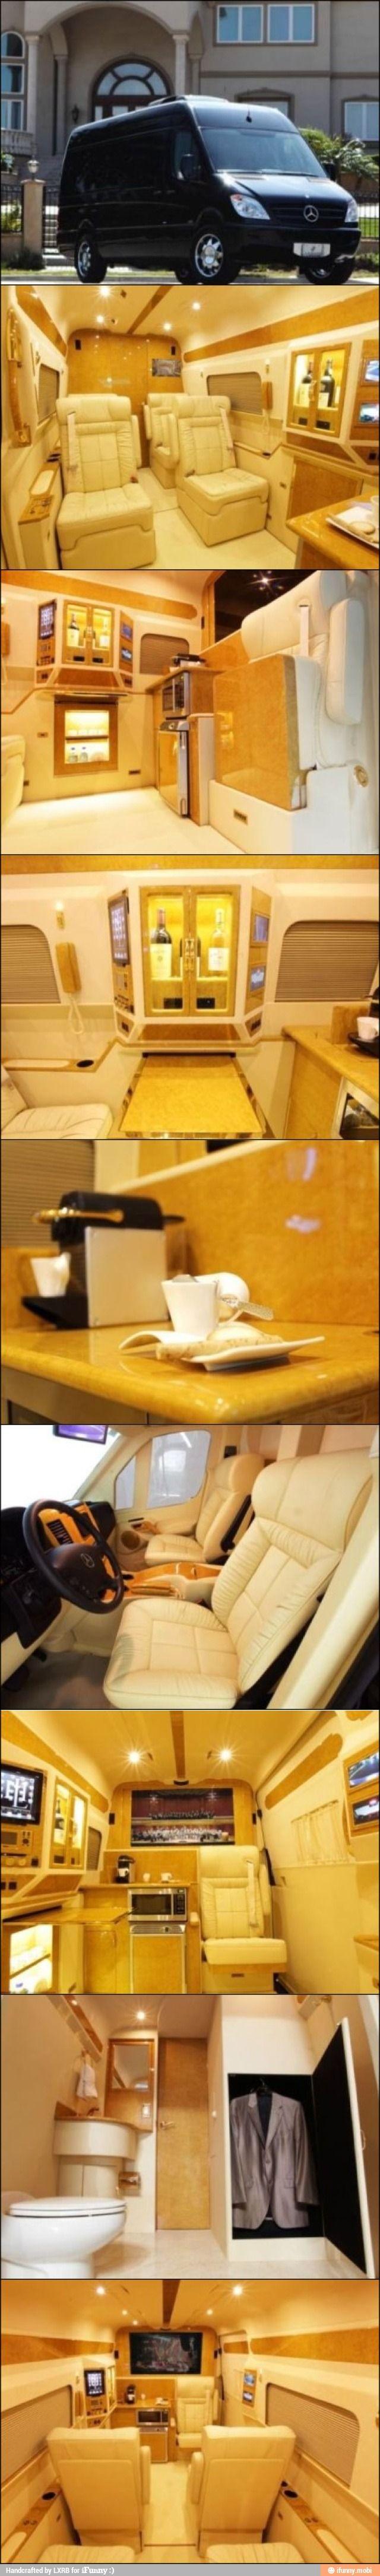 Mobile home / iFunny :)